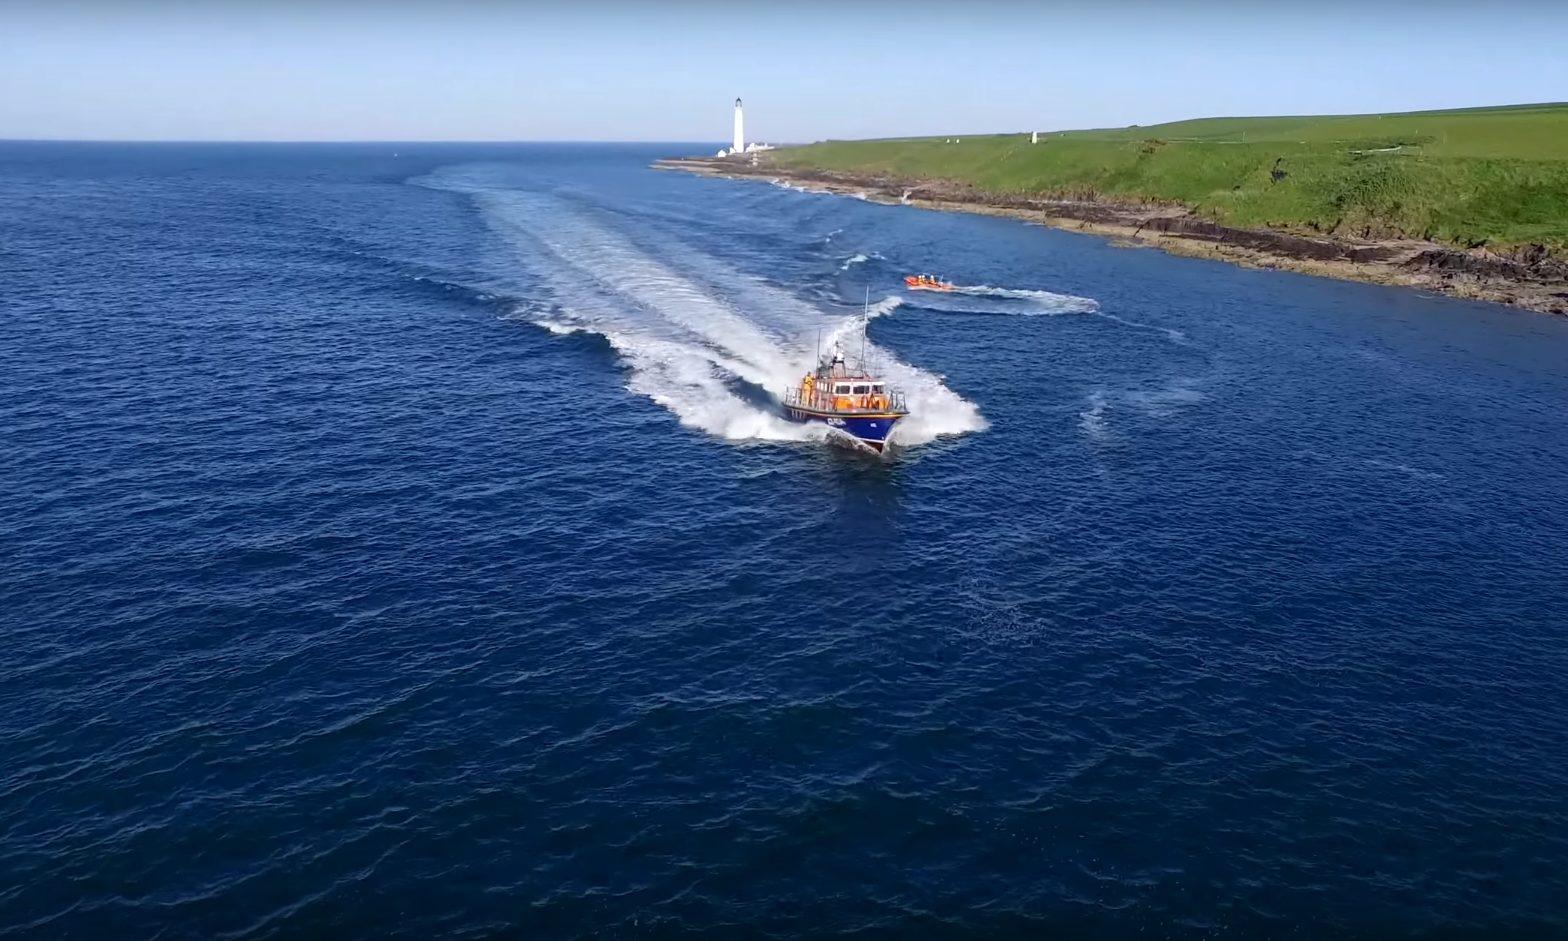 Montrose Inshore Lifeboat (ILB) Nigel A Kennedy (stock image)